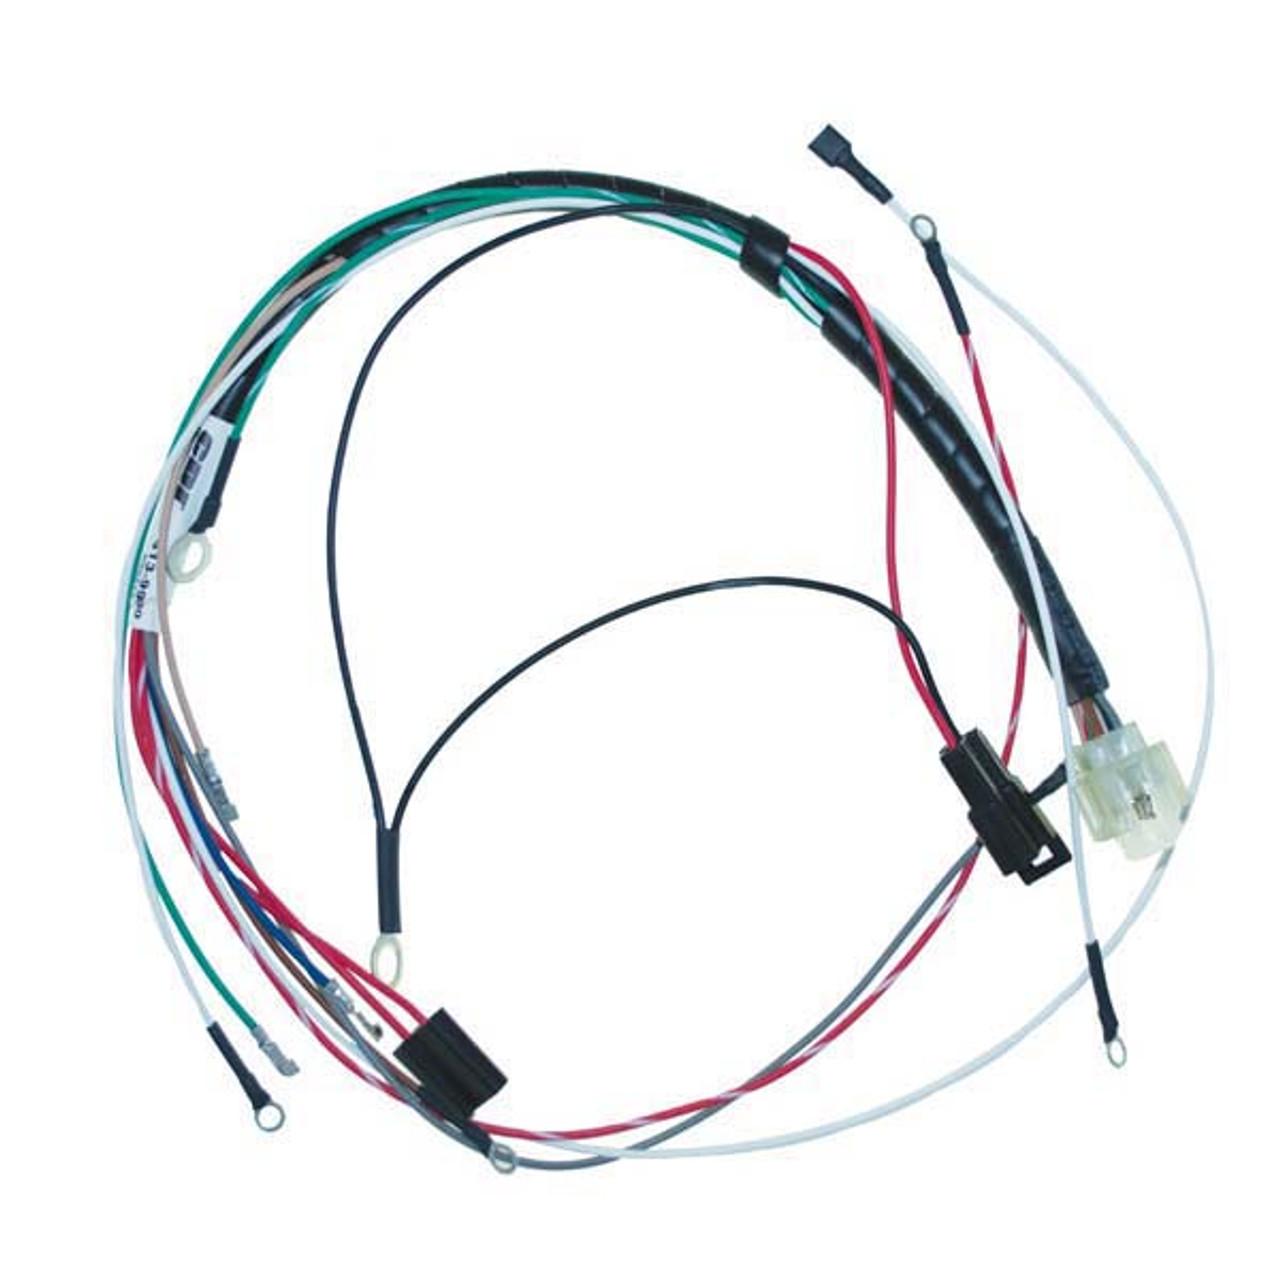 Cdi 413 9900 Johnson Evinrude Outboard Wiring Harness